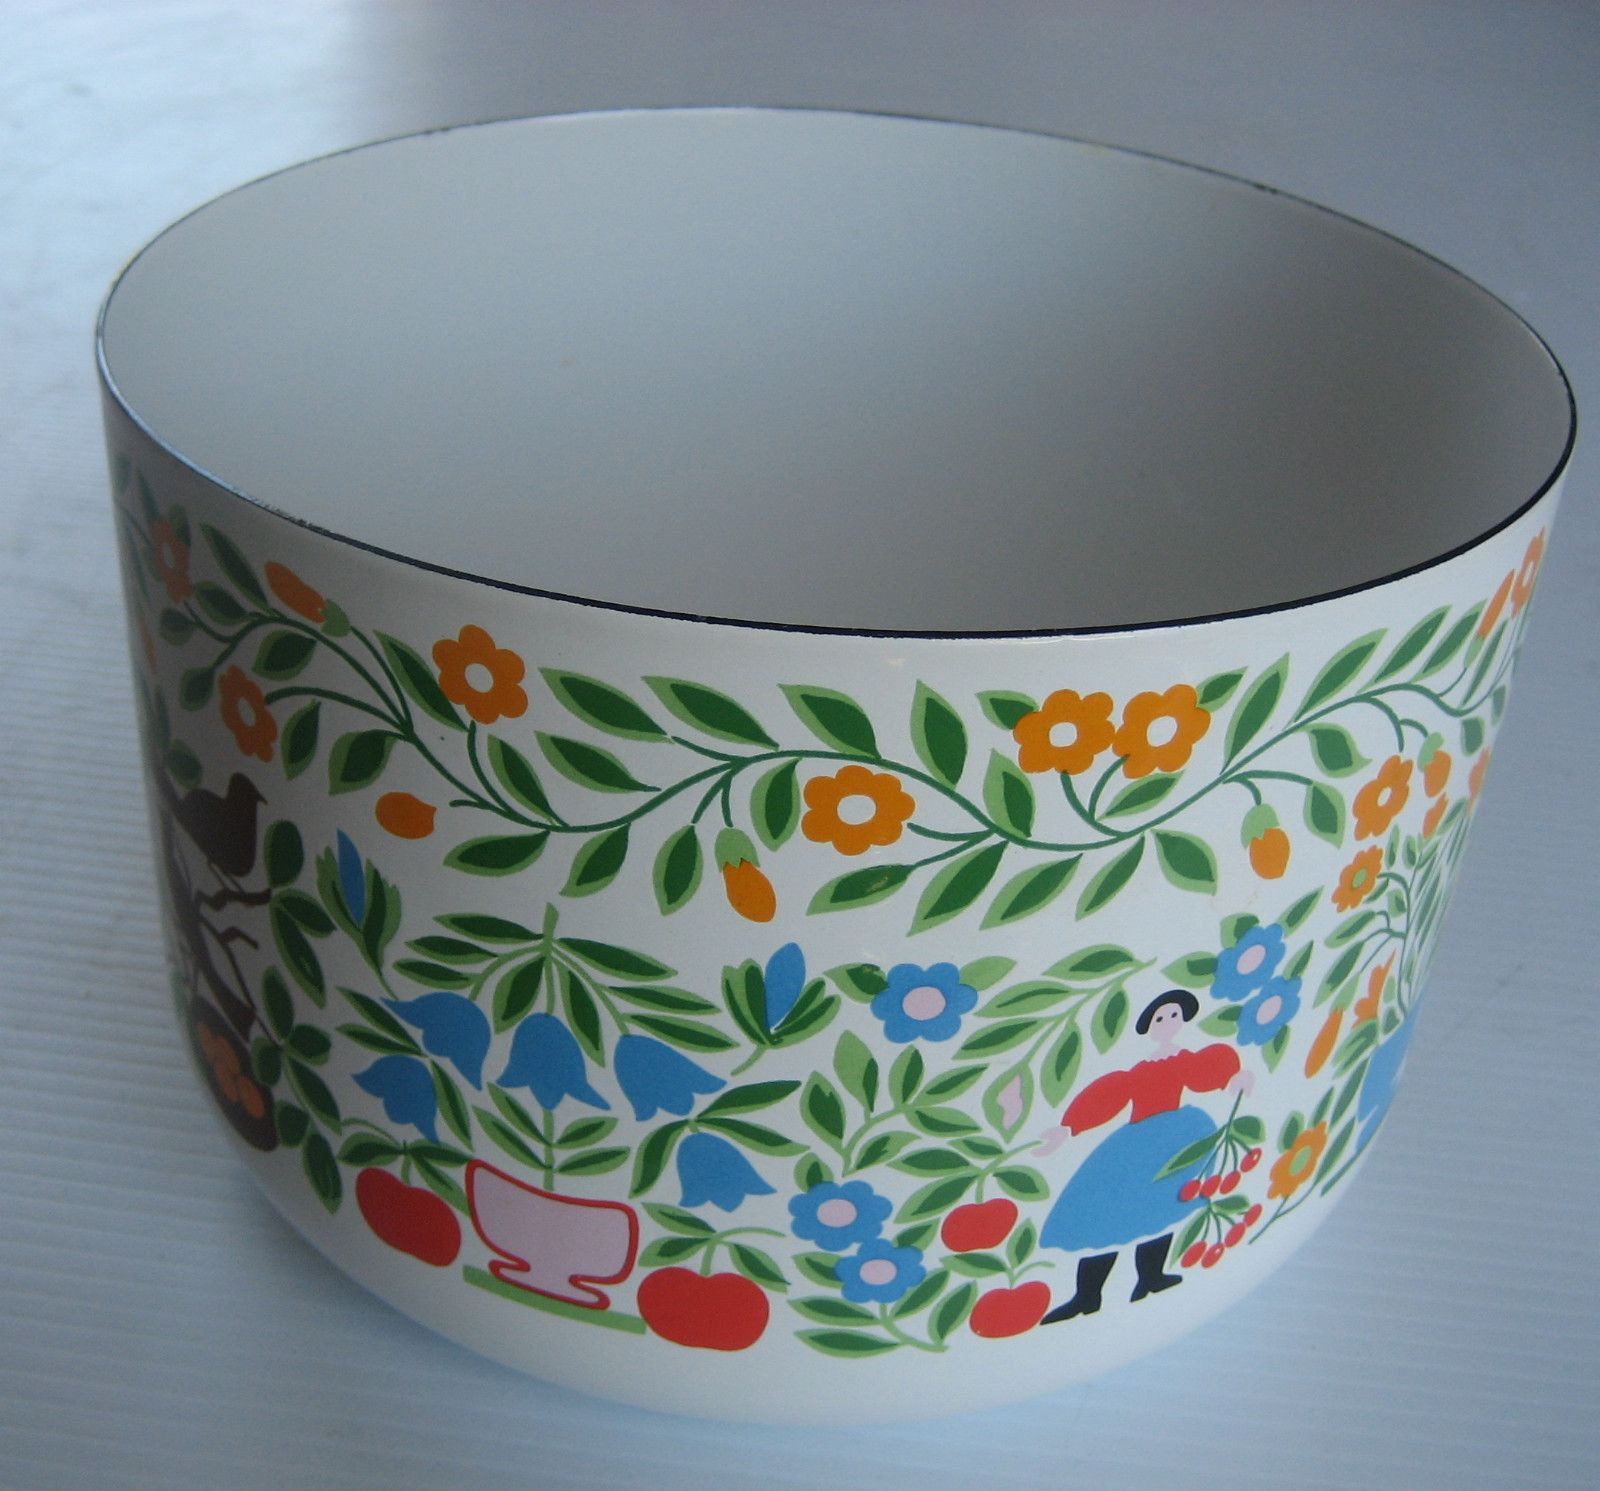 enamel bowl made in Japan